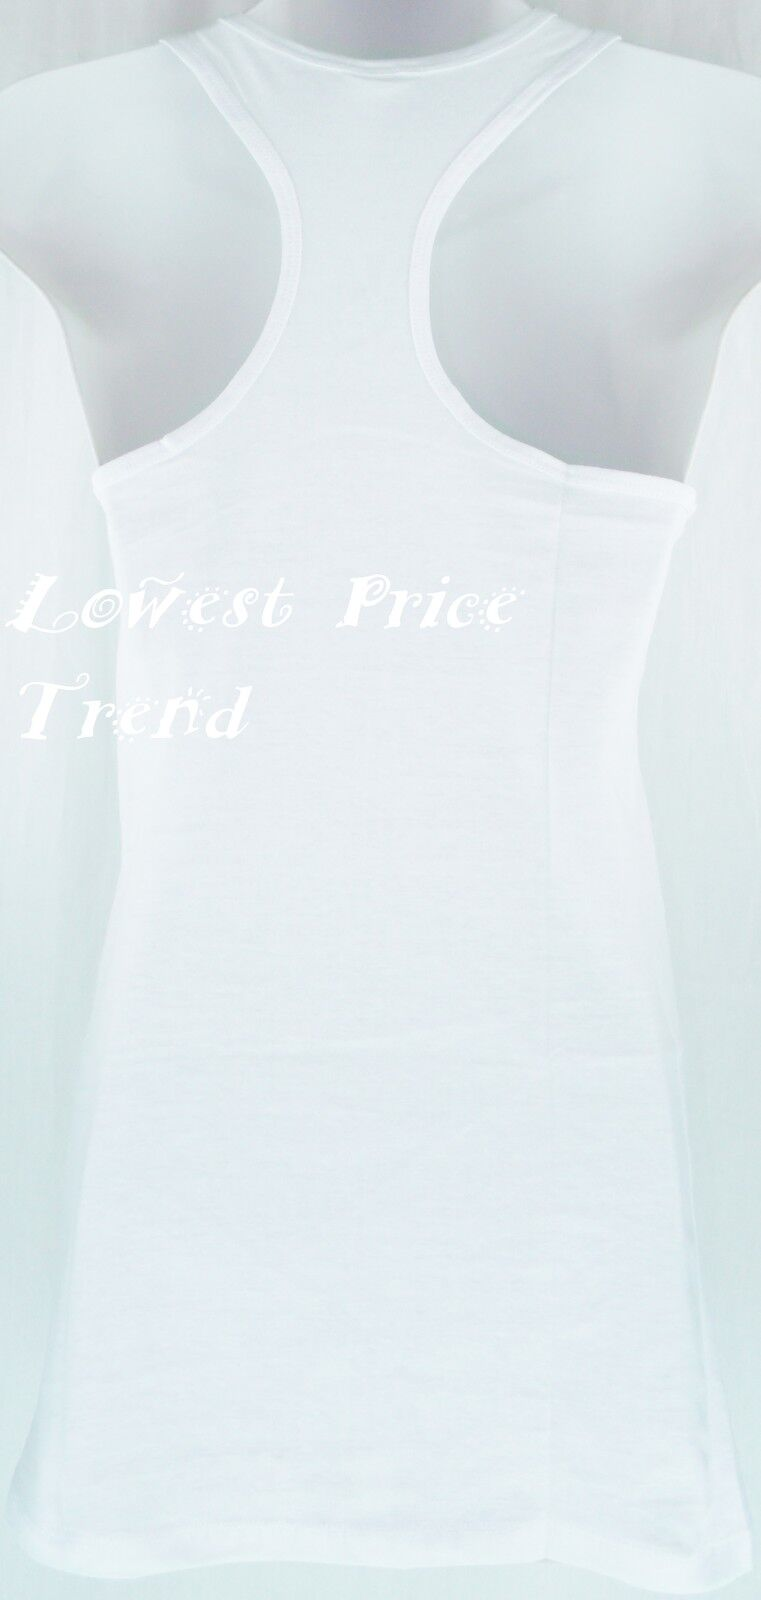 S M L Women Cotton RACERBACK TANK TOP Soft Stretchy Seamless Jersey Tank TT402